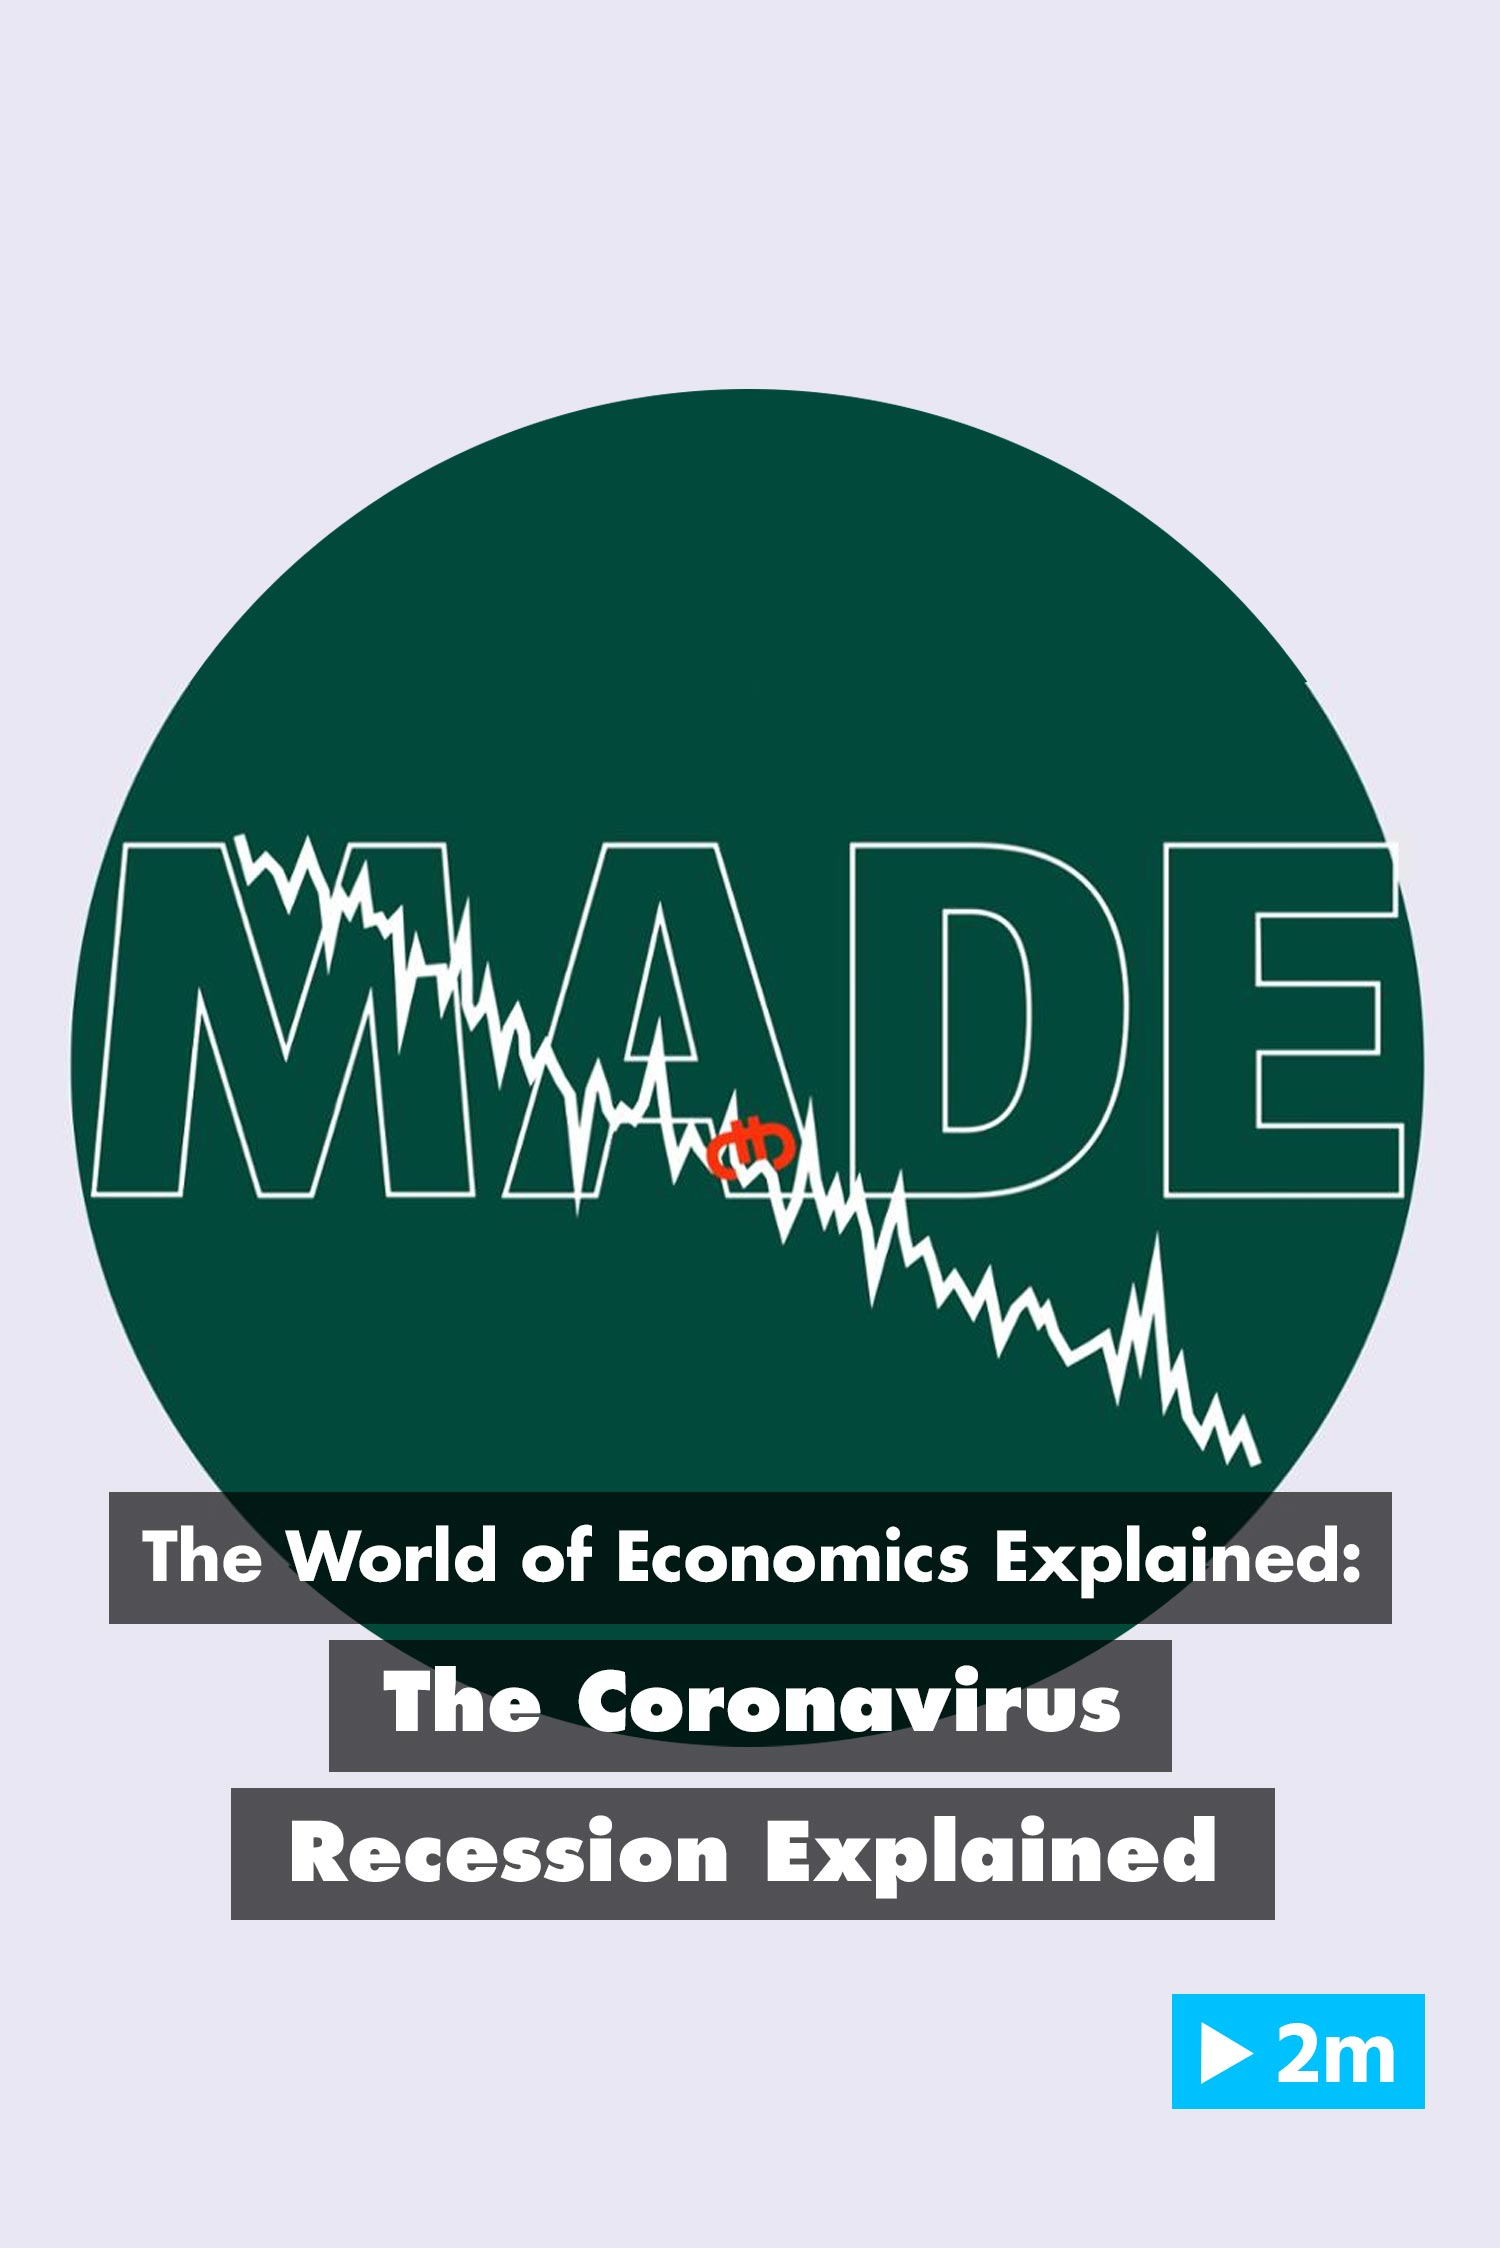 The World of Economics Explained: Recession - The Coronavirus Recession Explained